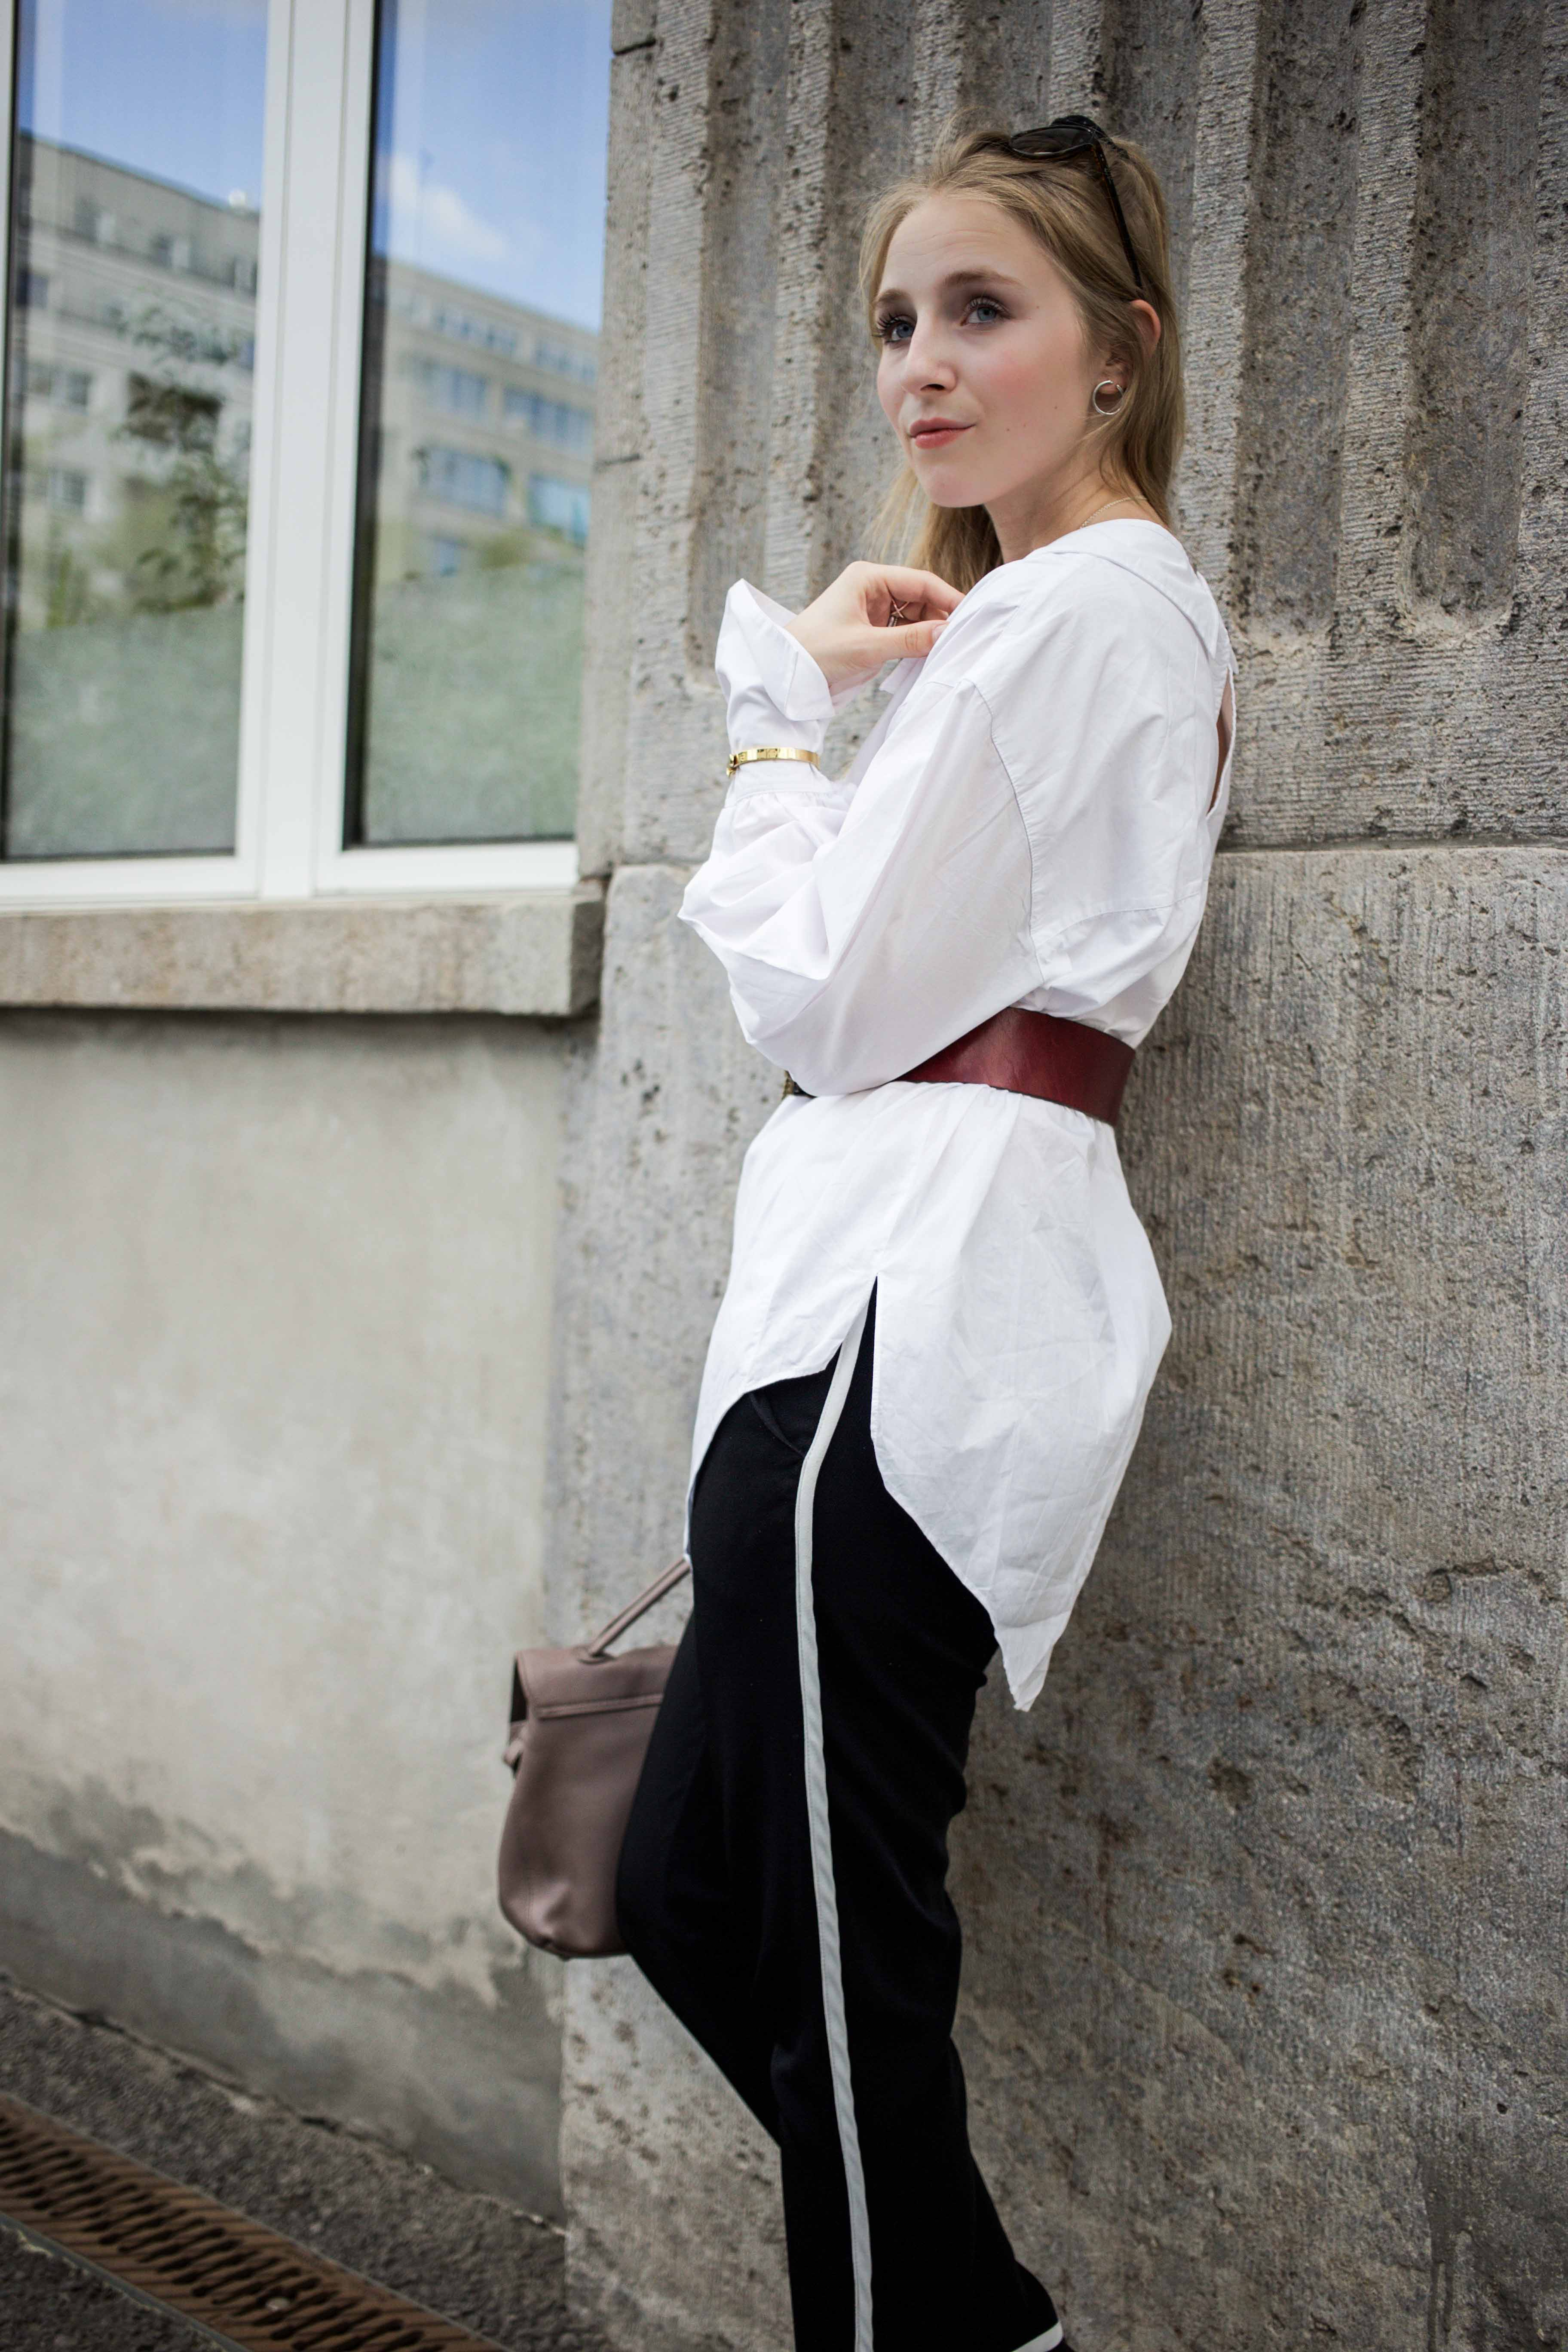 fashionweek-berlin-statement-gürtel-oversized-bluse-outfit-modeblog_6351